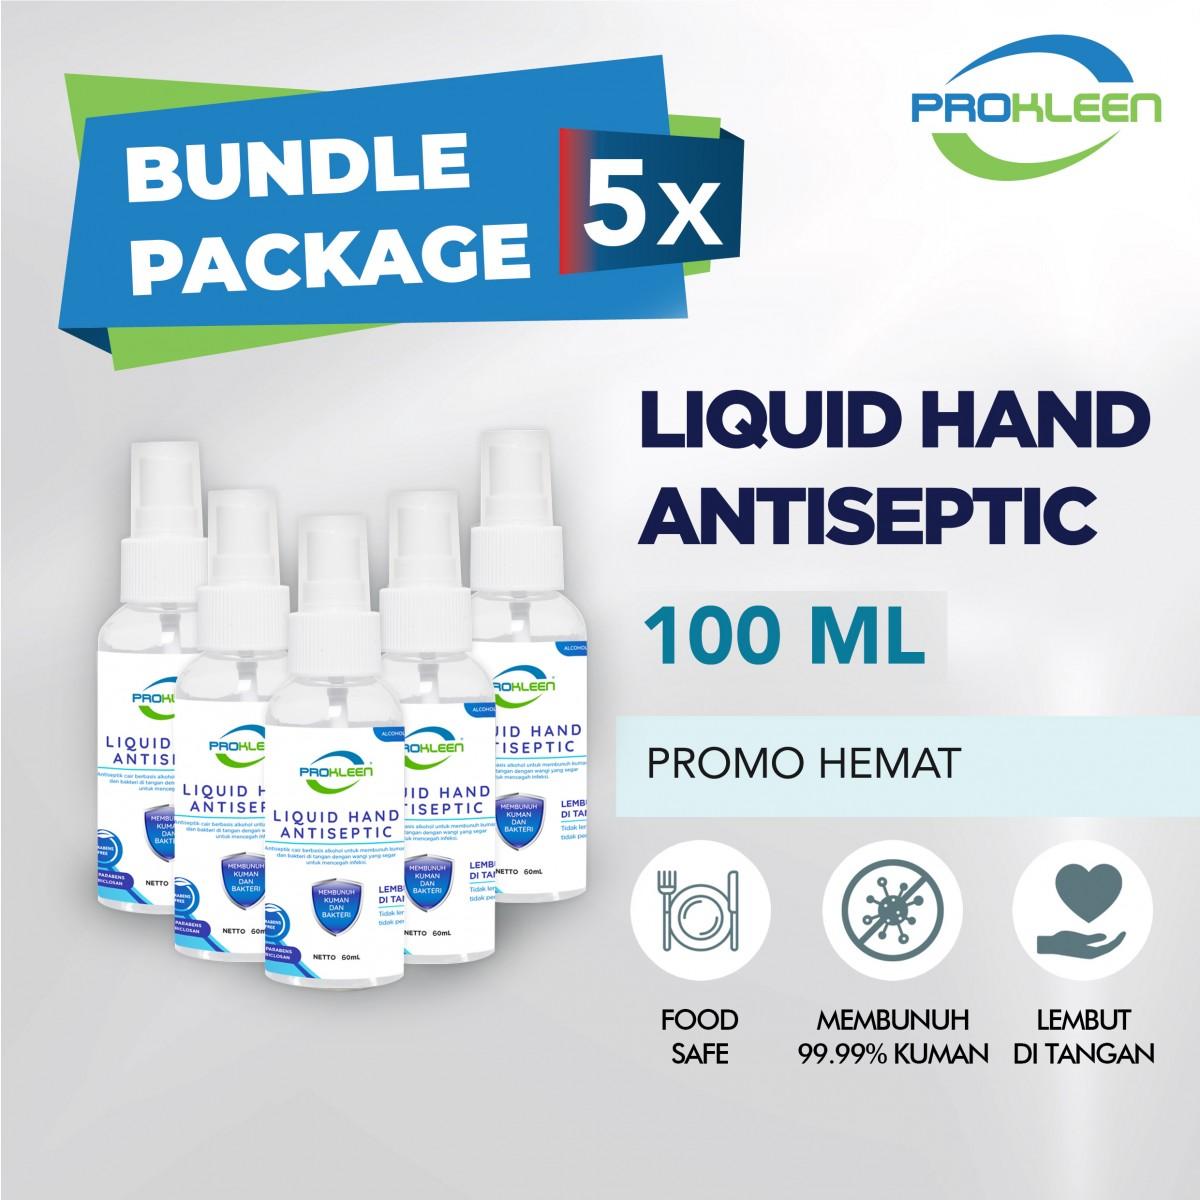 [BUNDLE] Hand Sanitizer CAIR 70% Food Grade PROKLEEN 100mL - 5pcs - United Cleaning Enterprise